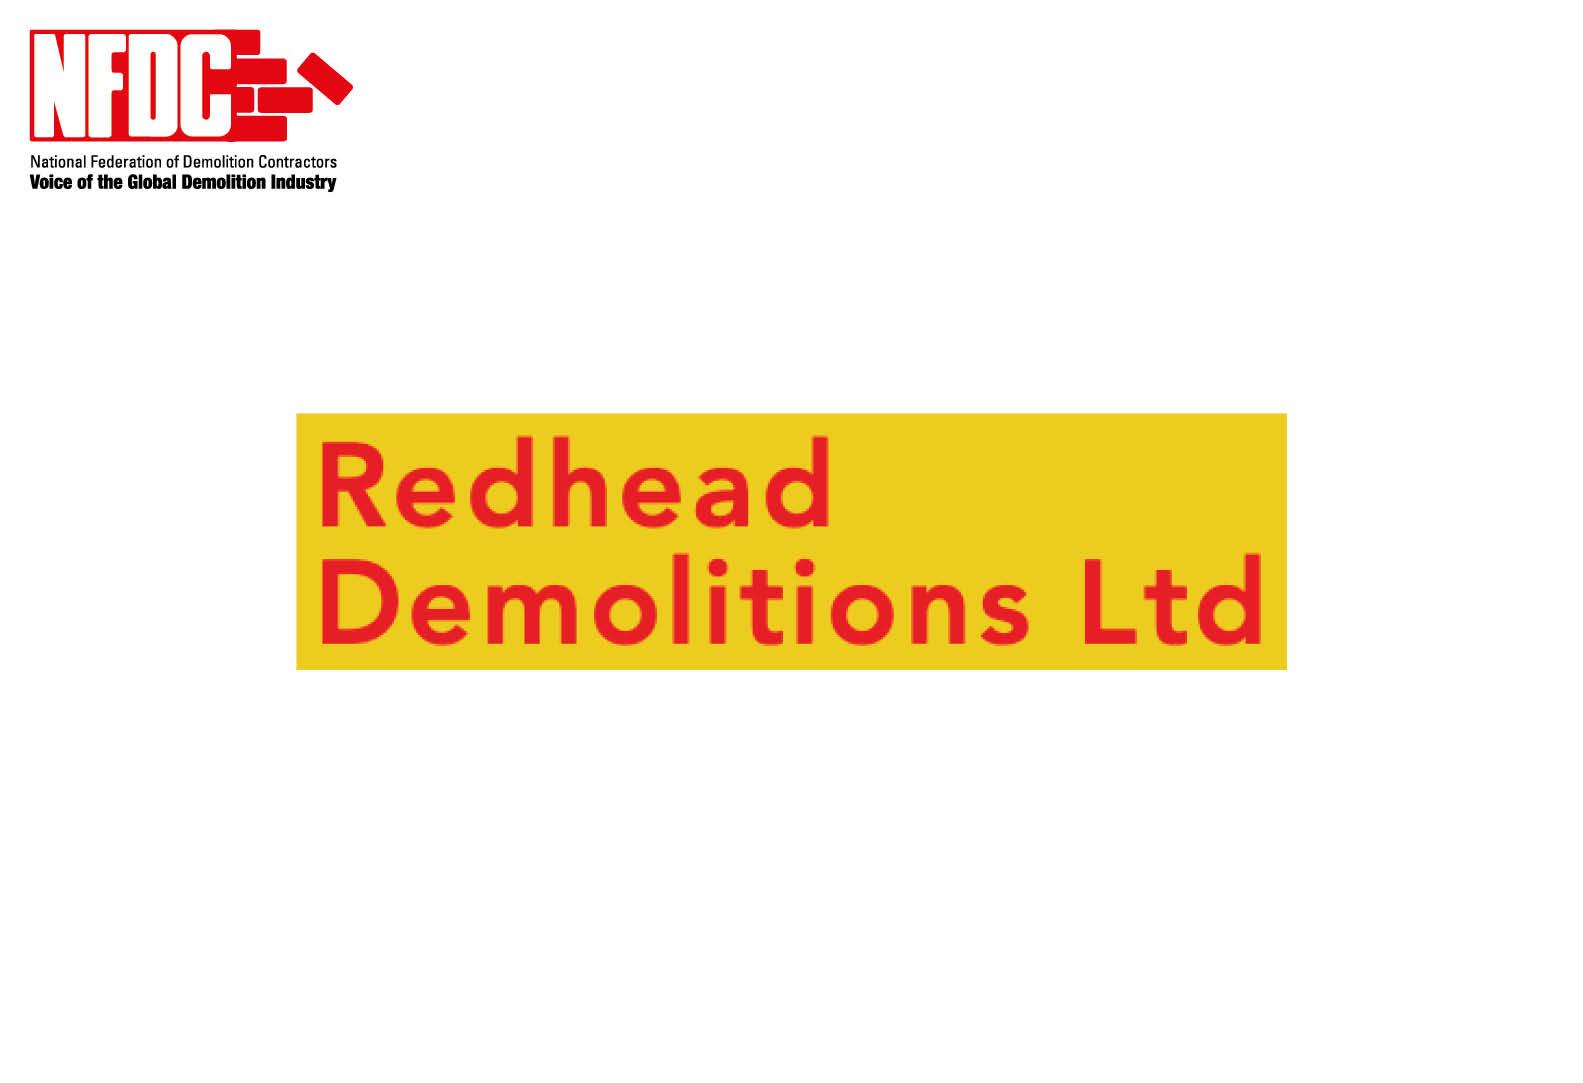 Redhead Demolitions